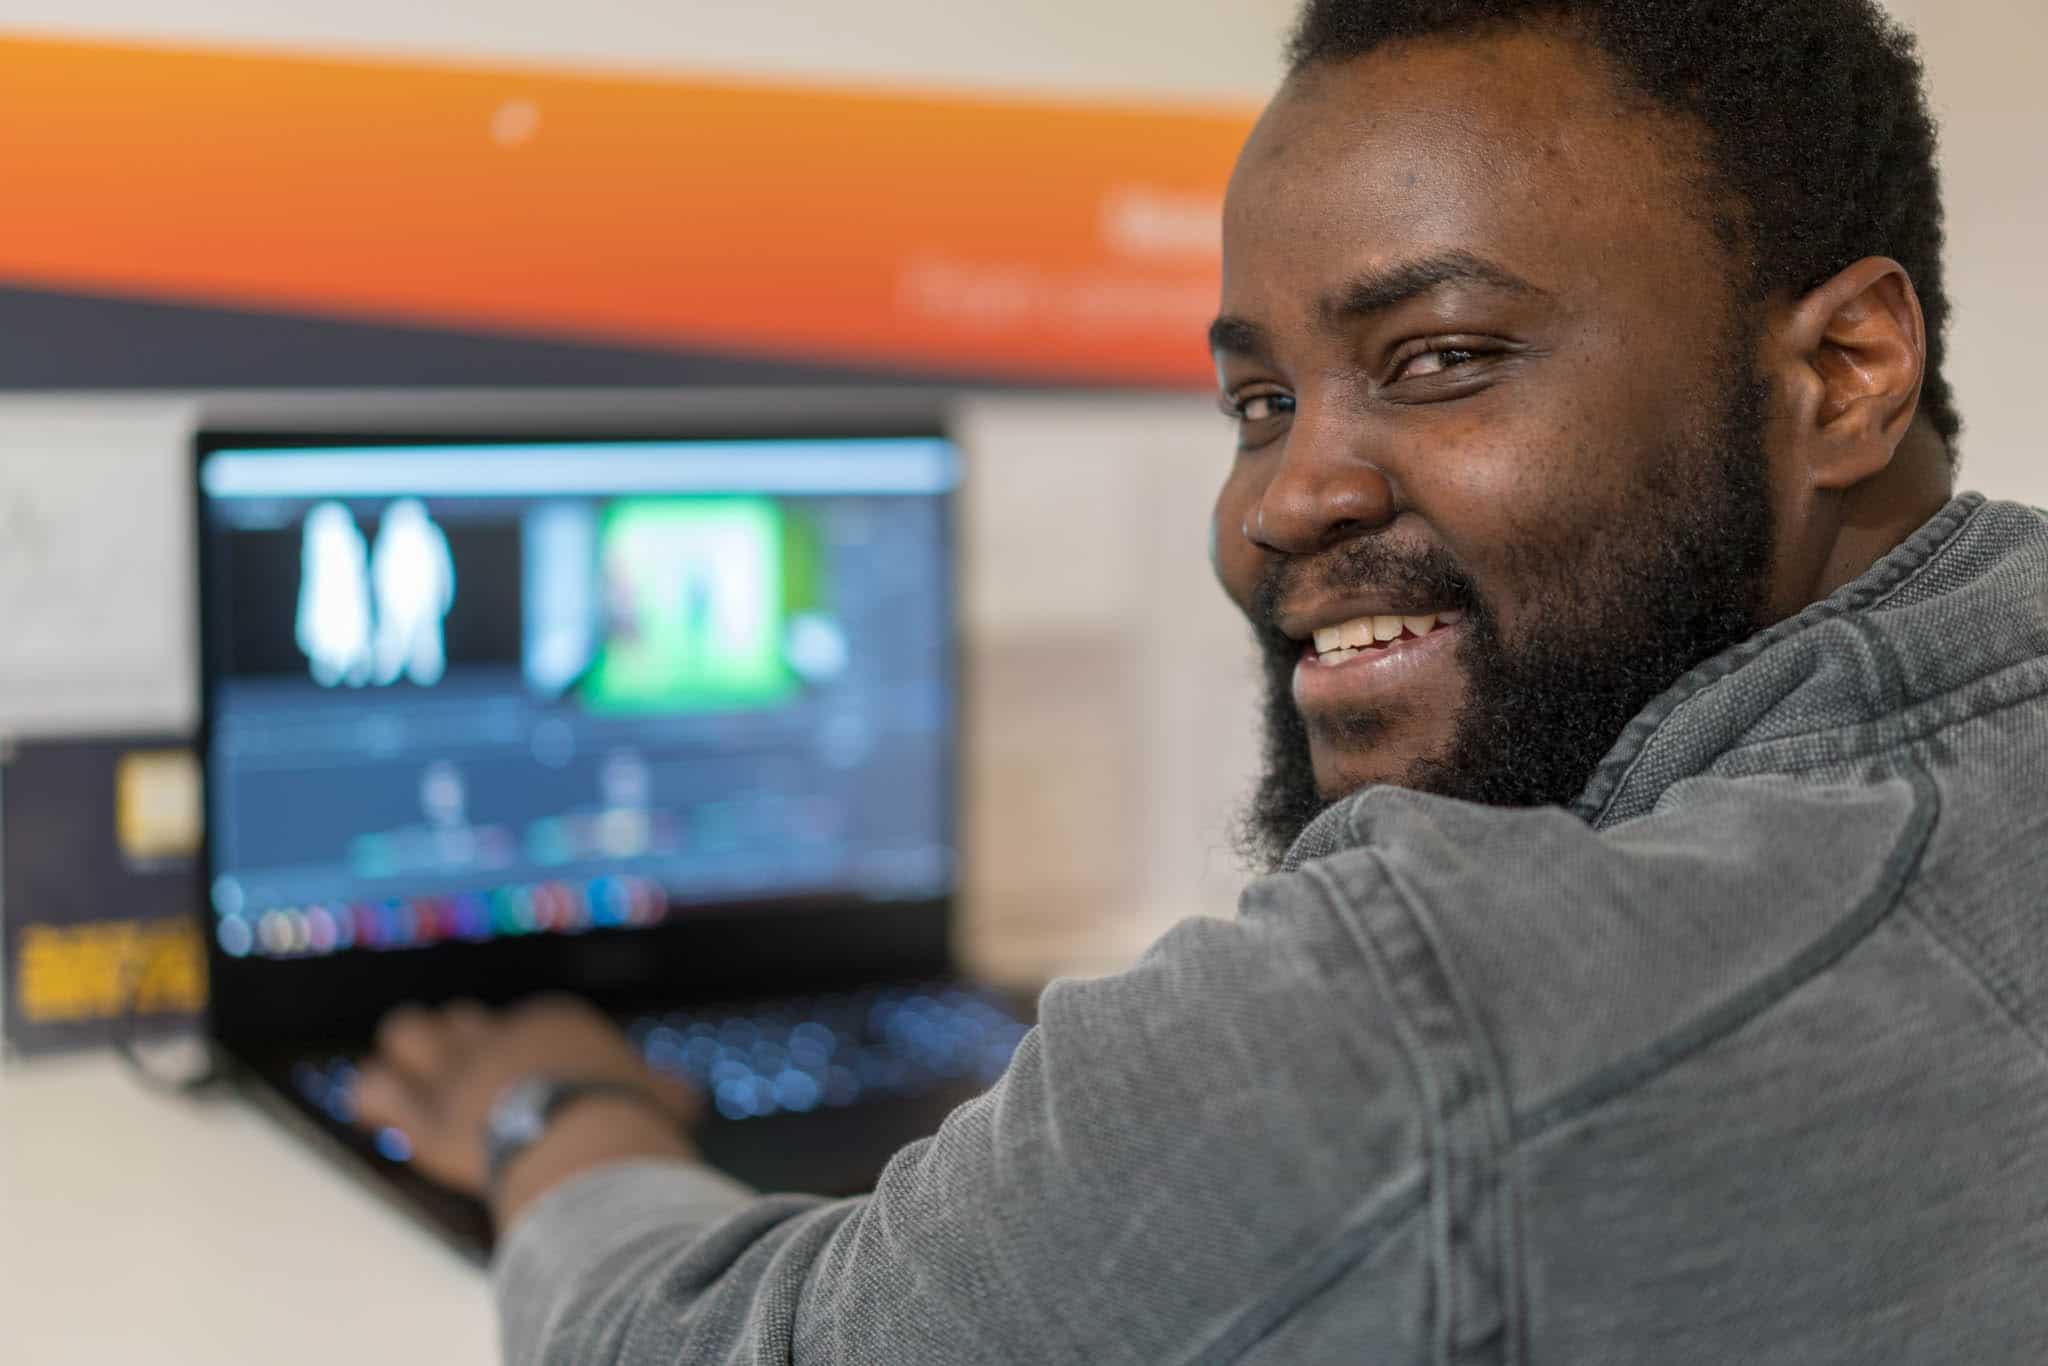 man smiling at camera whilst working on laptop